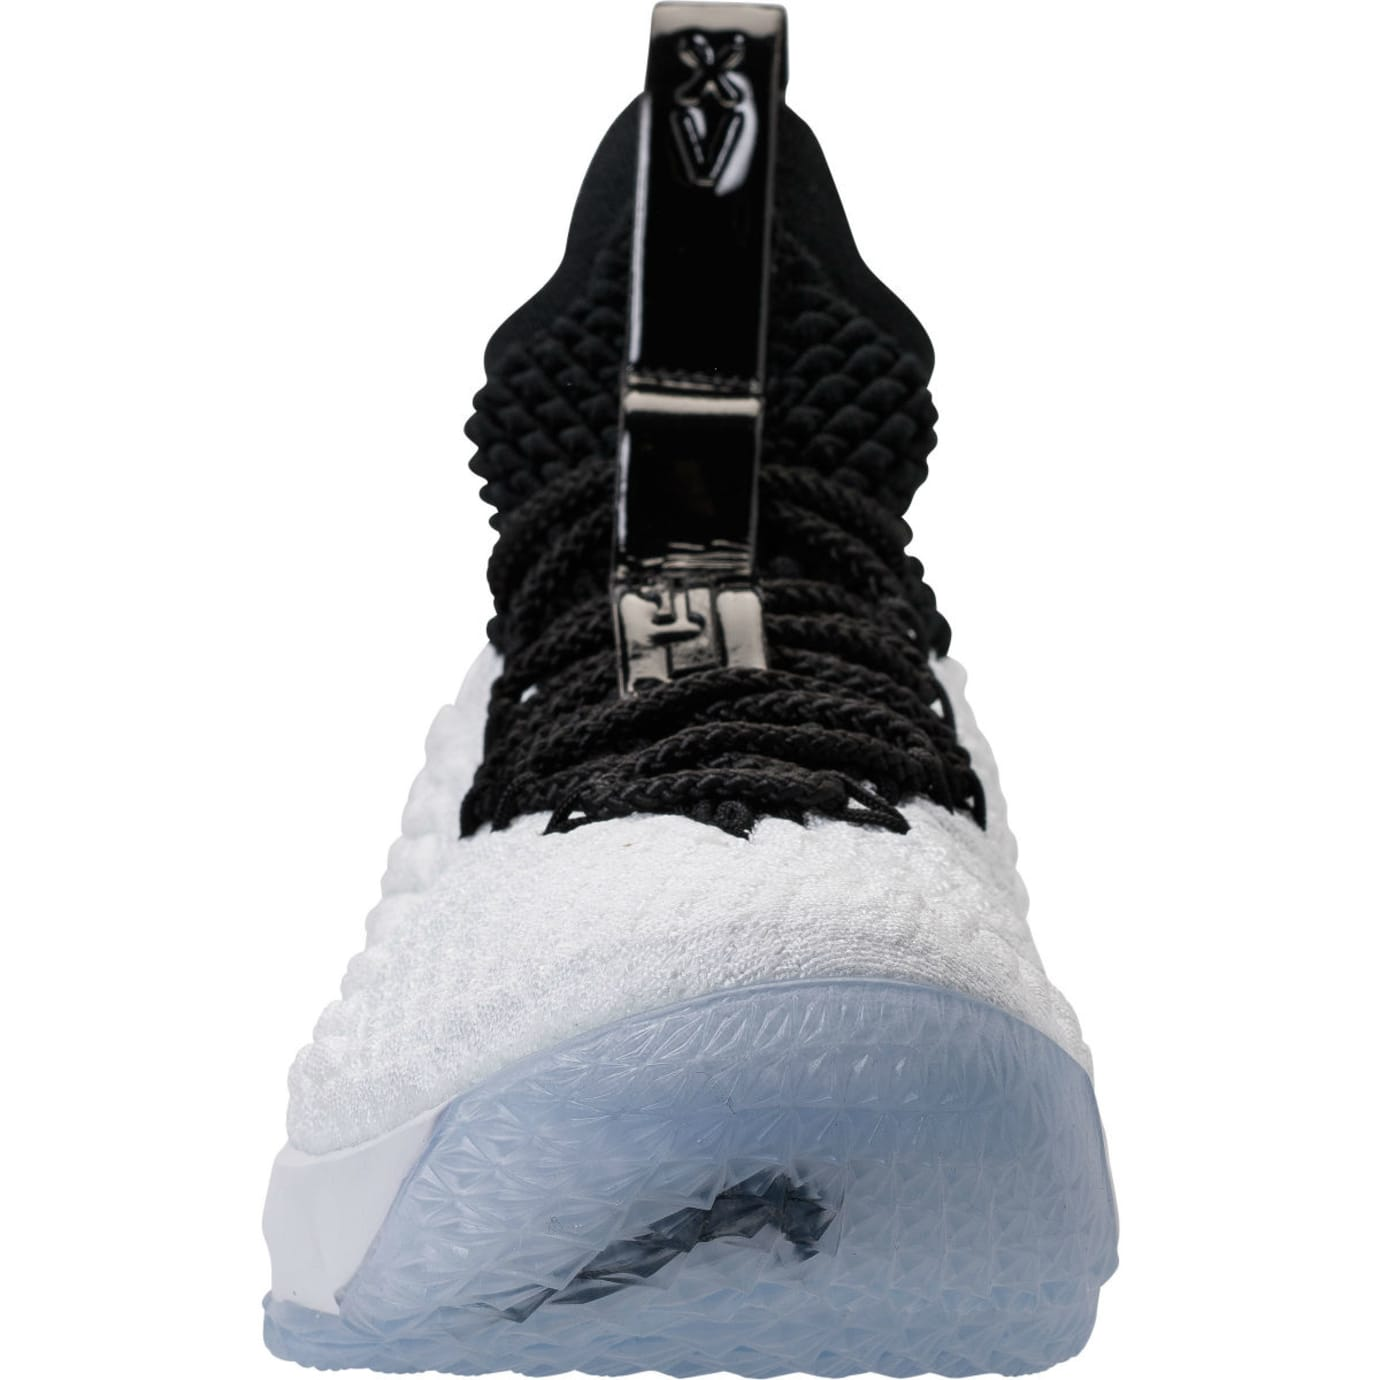 ba8db398000 Nike LeBron 15 Graffiti Release Date AQ2363-100 Front